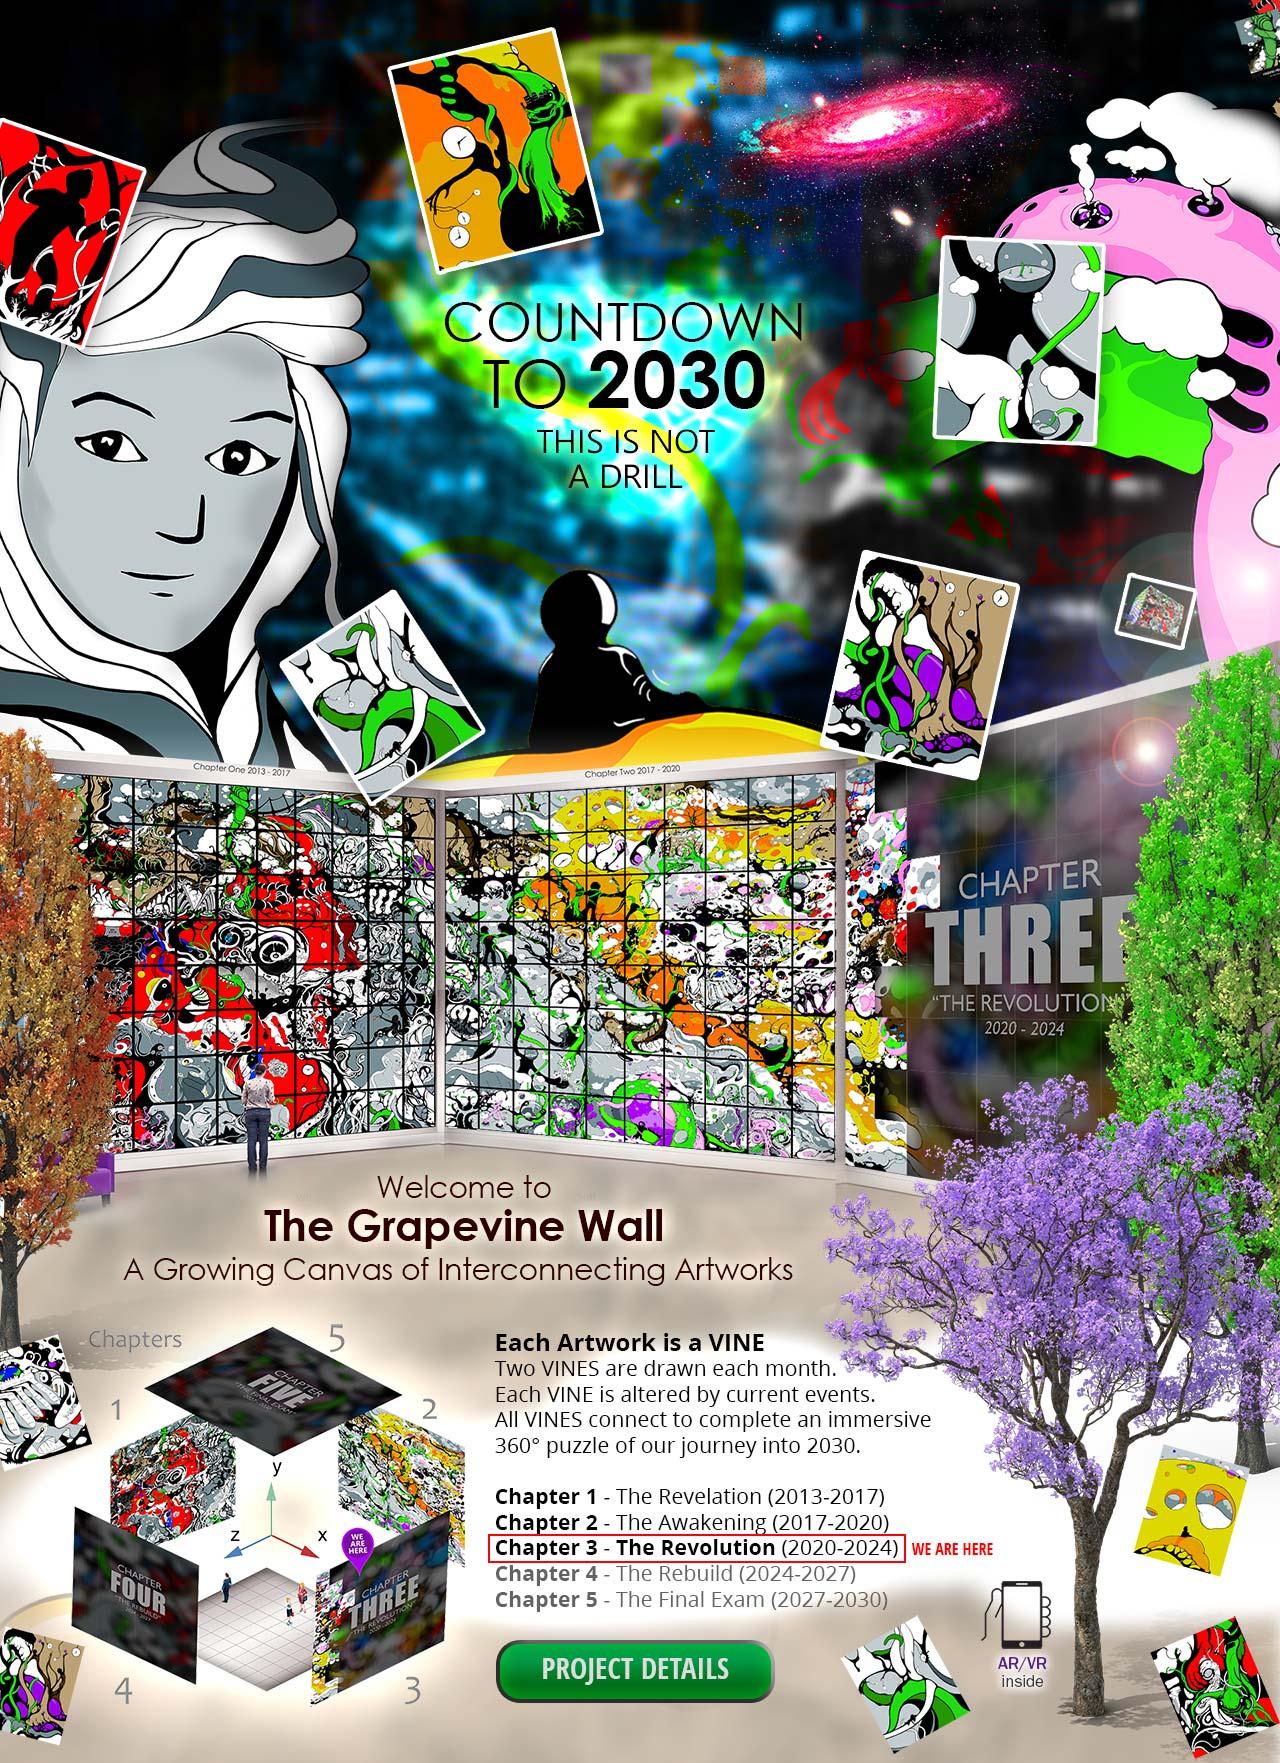 Grapevinewall-home-header-02